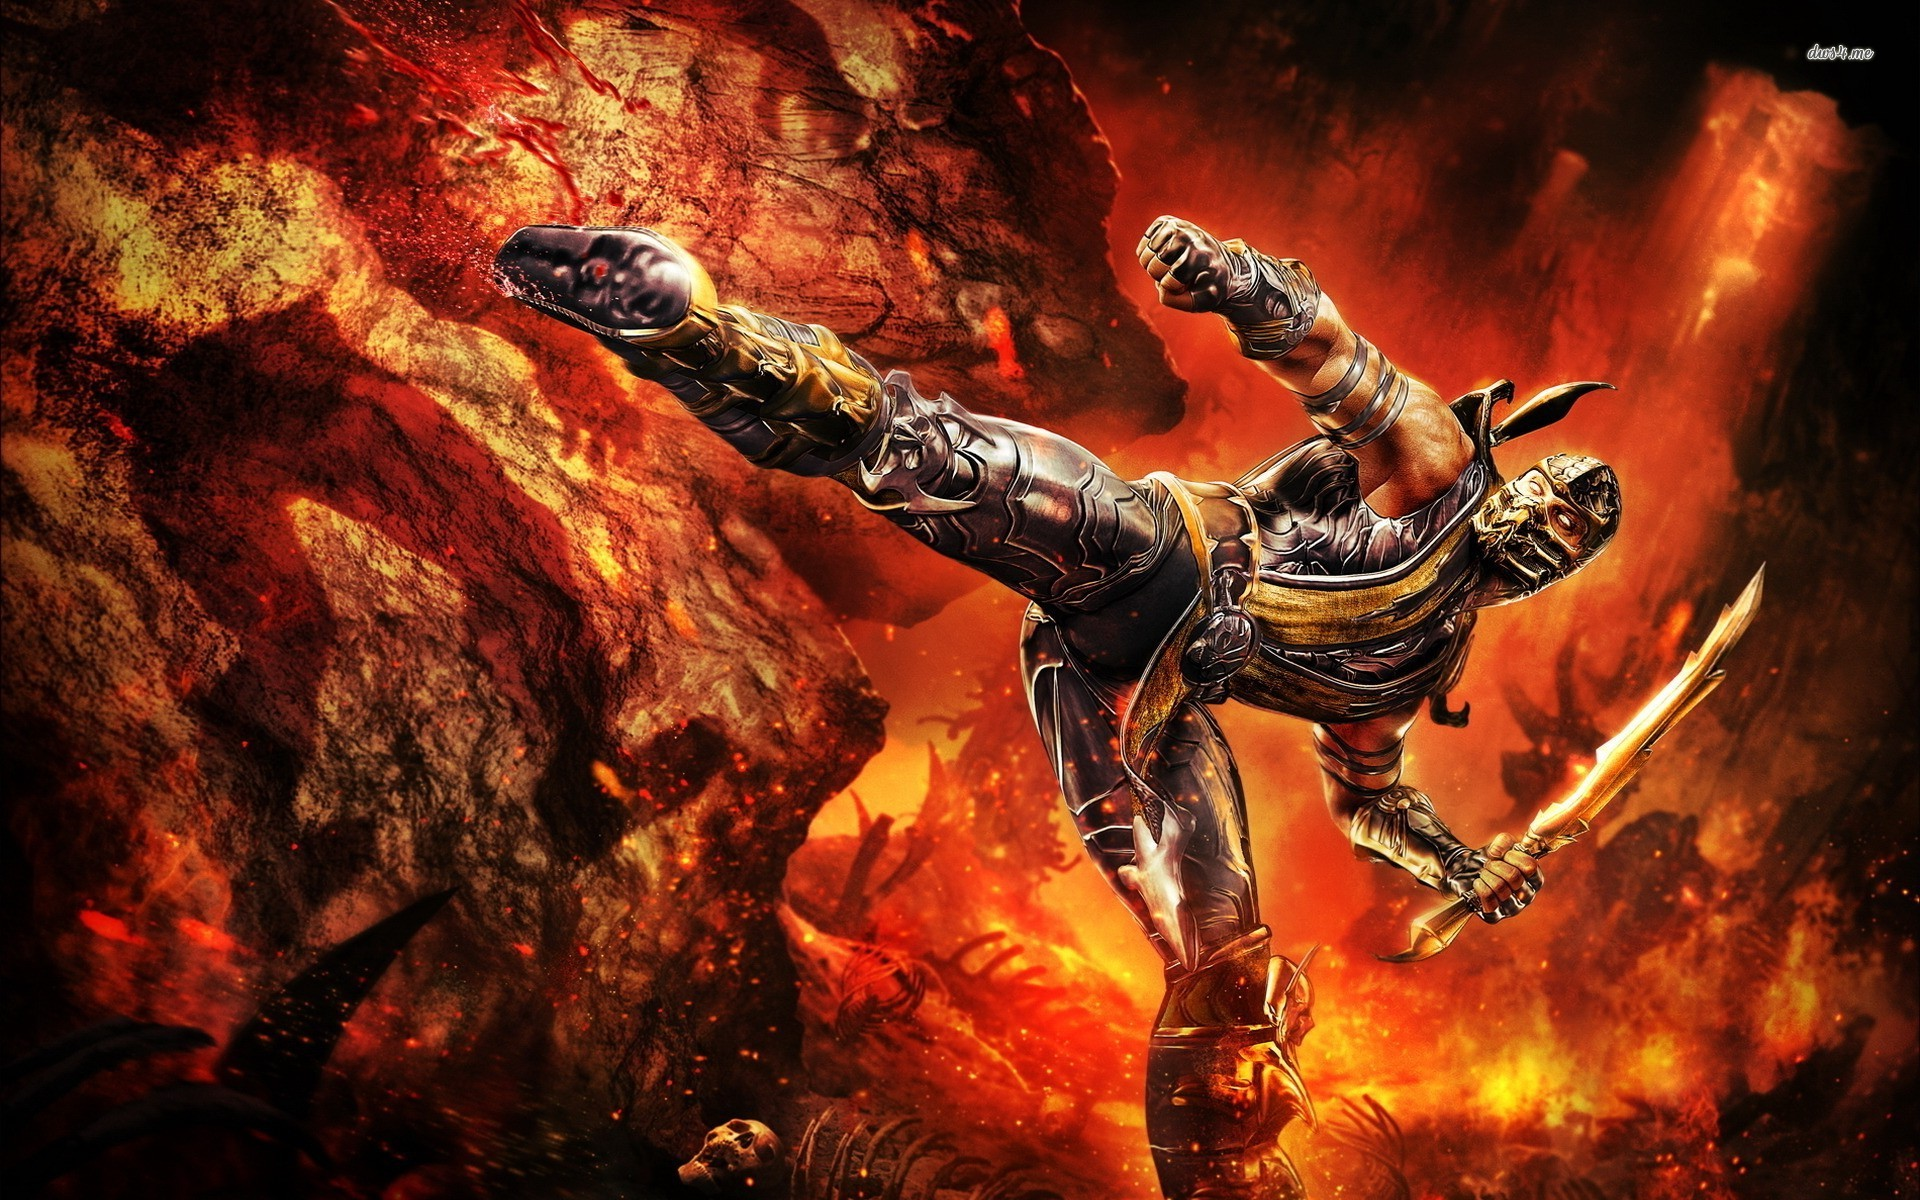 ... Scorpion - Mortal Kombat wallpaper 1920x1200 ...